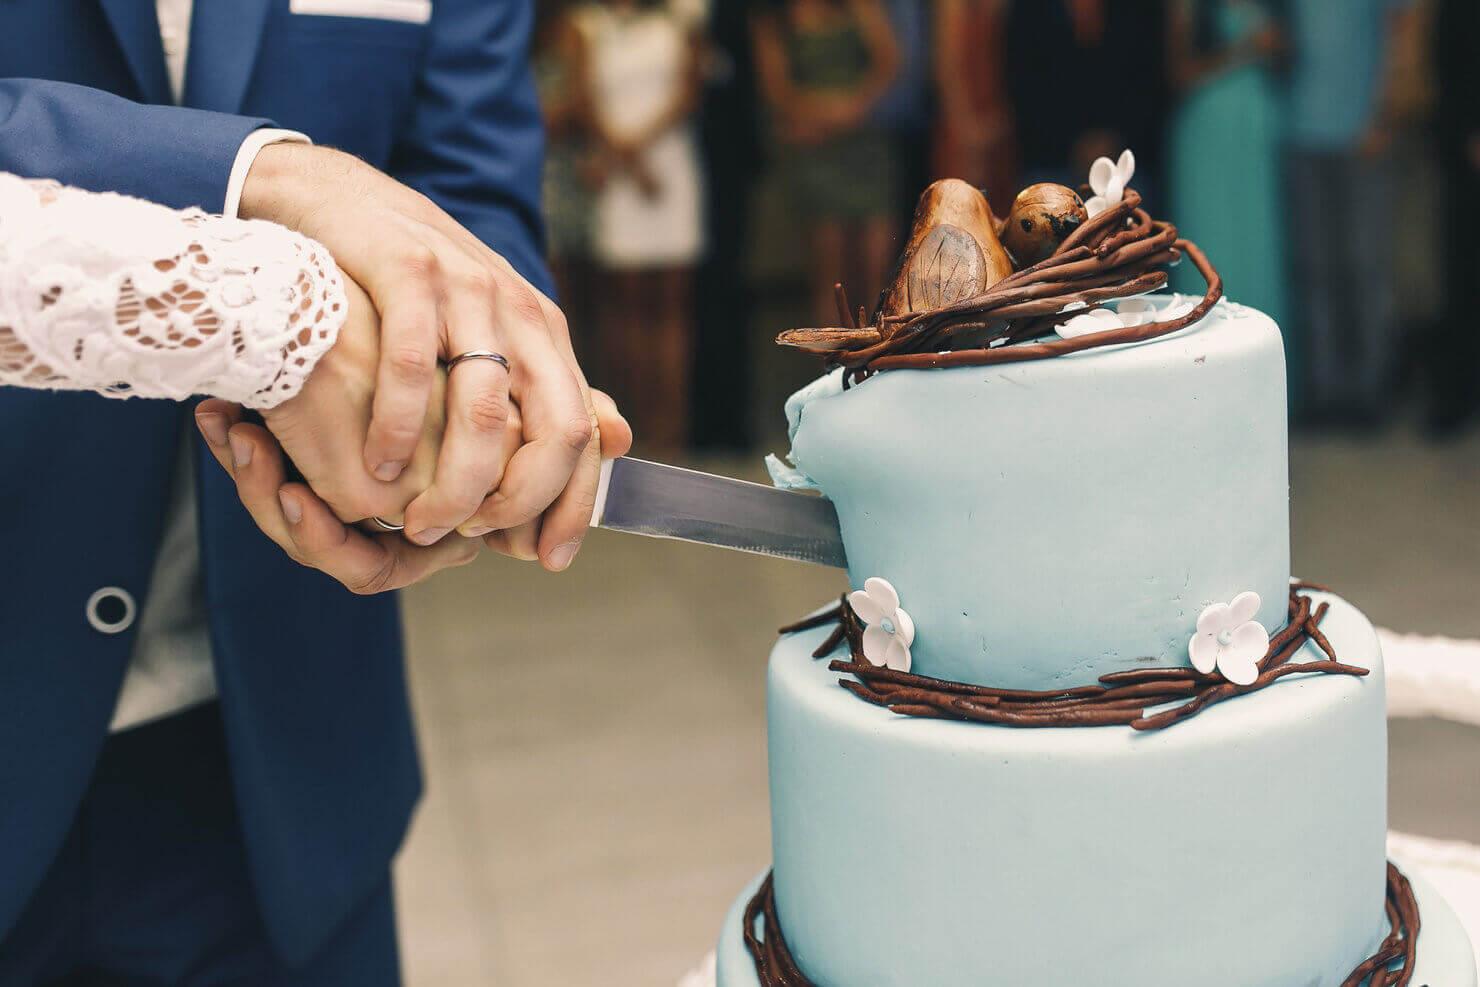 wedding cake cutting muvee. Black Bedroom Furniture Sets. Home Design Ideas